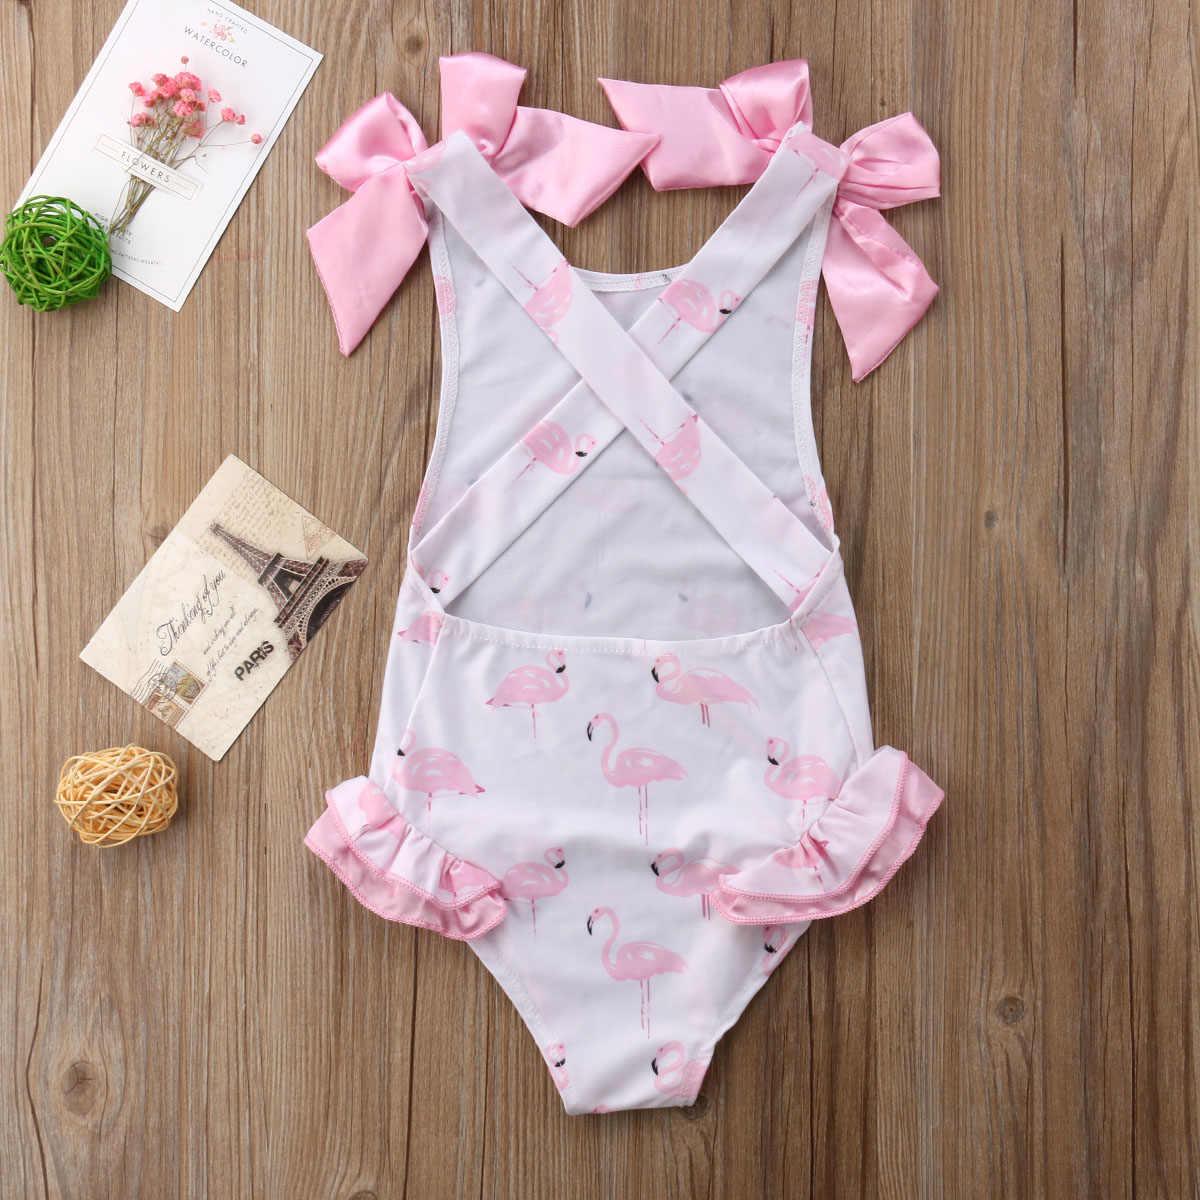 6b416f37583 Summer Baby Girl Bow Swimsuit Flamingo Kids Bodysuit Swimming Clothes  Swimwear Bathing Suit For Baby Girl